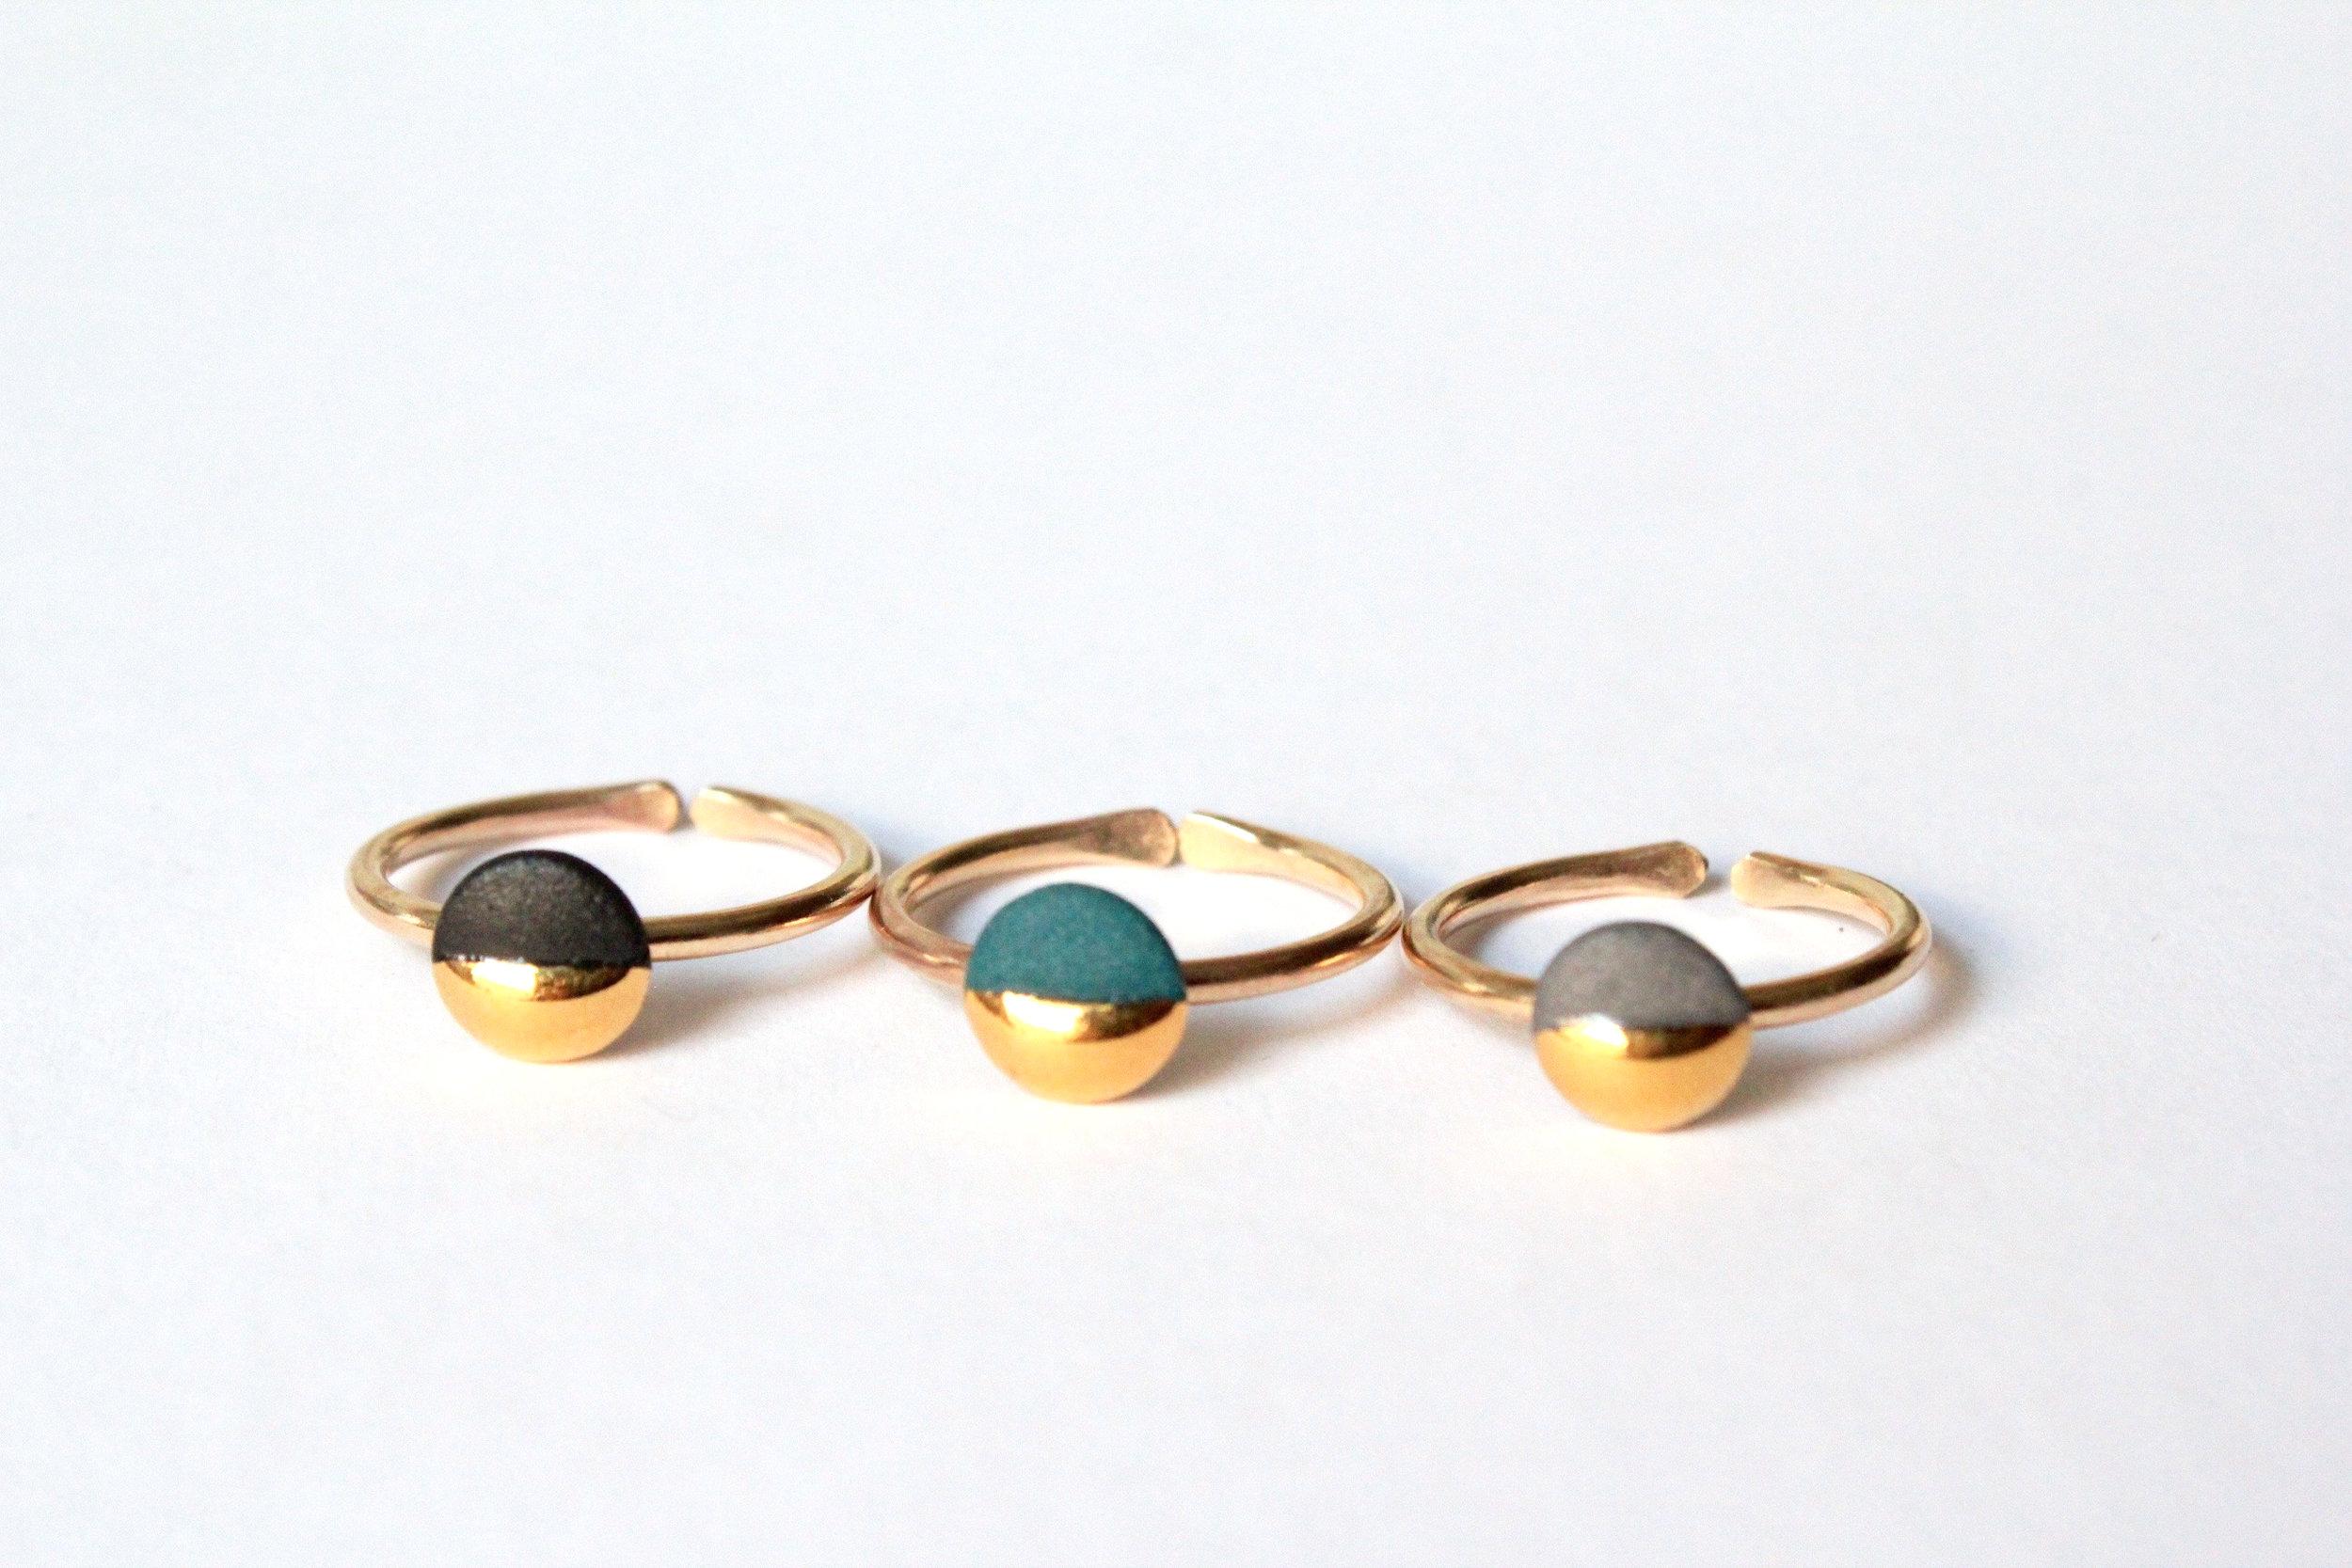 Gold Dipped Flat Circle Rings